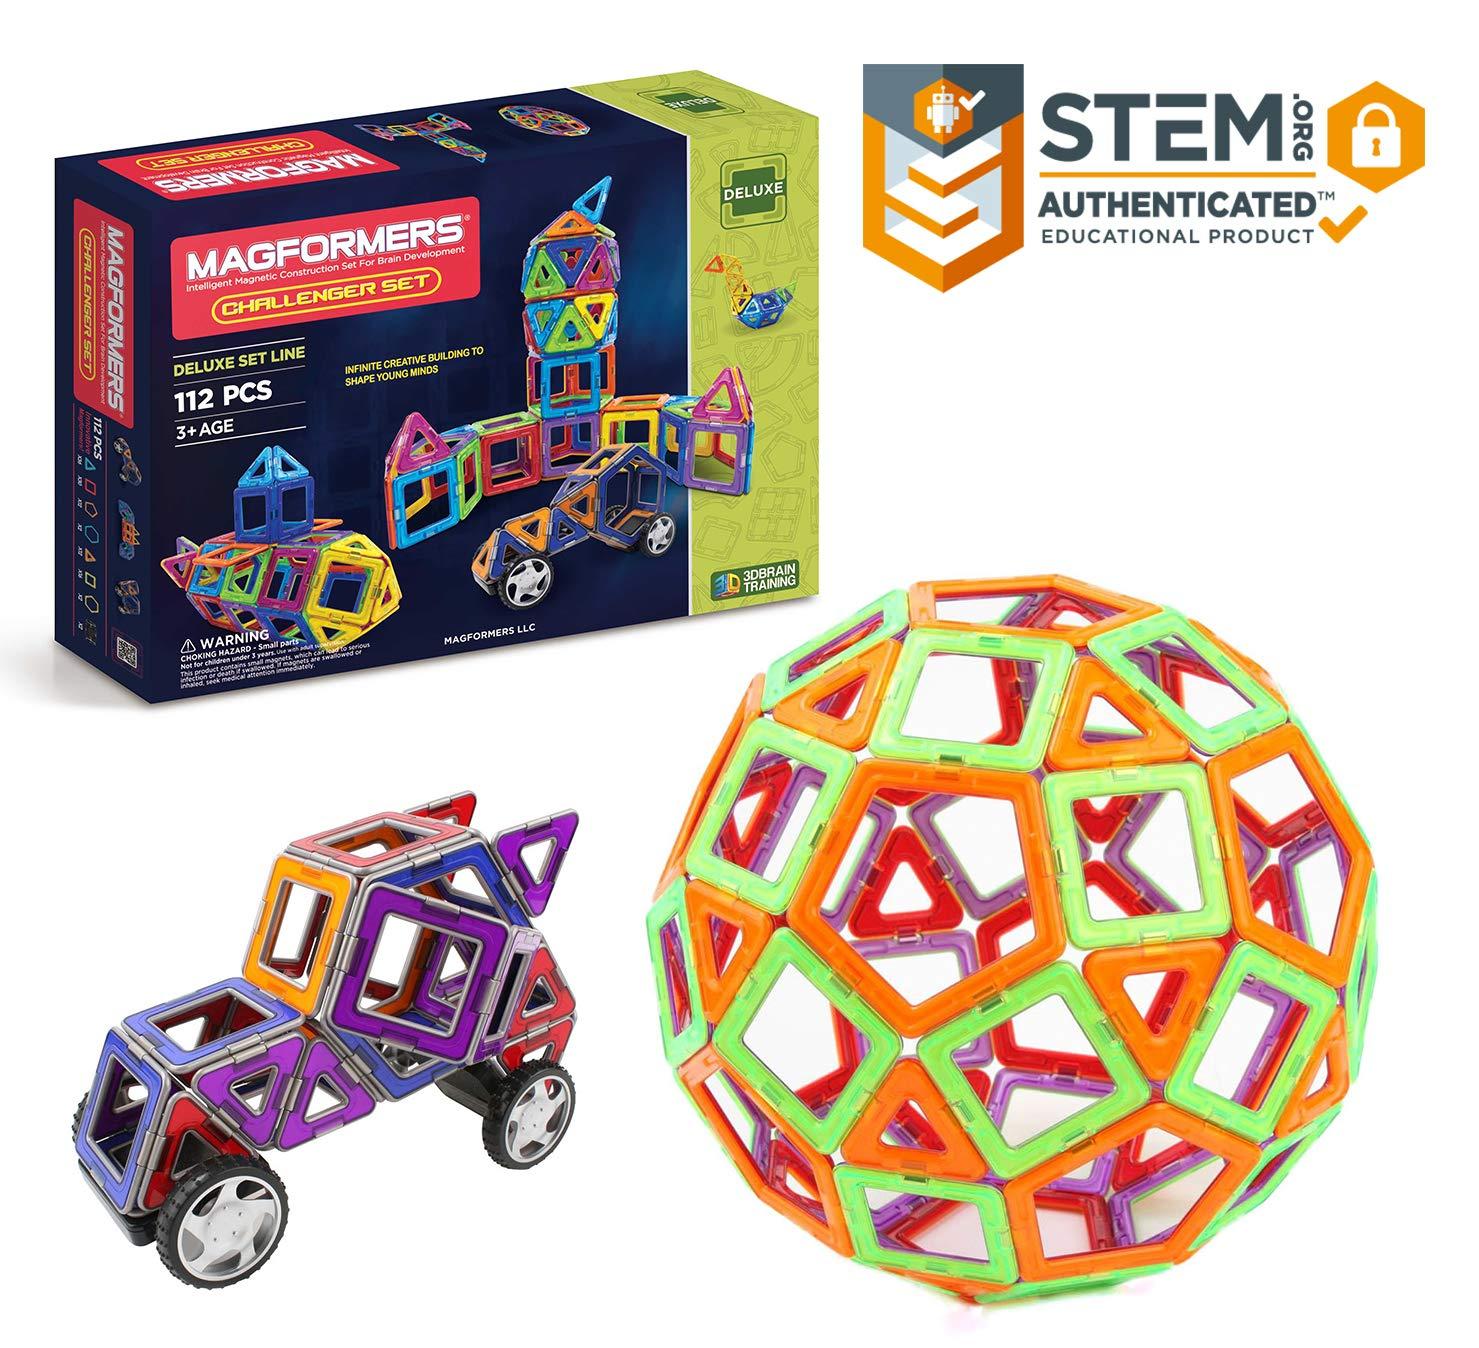 Magformers Challenger Set (112-pieces) Deluxe Magnetic Building Blocks,  Educational Magnetic Tiles Kit , Magnetic Construction shapes STEM Toy Set  -